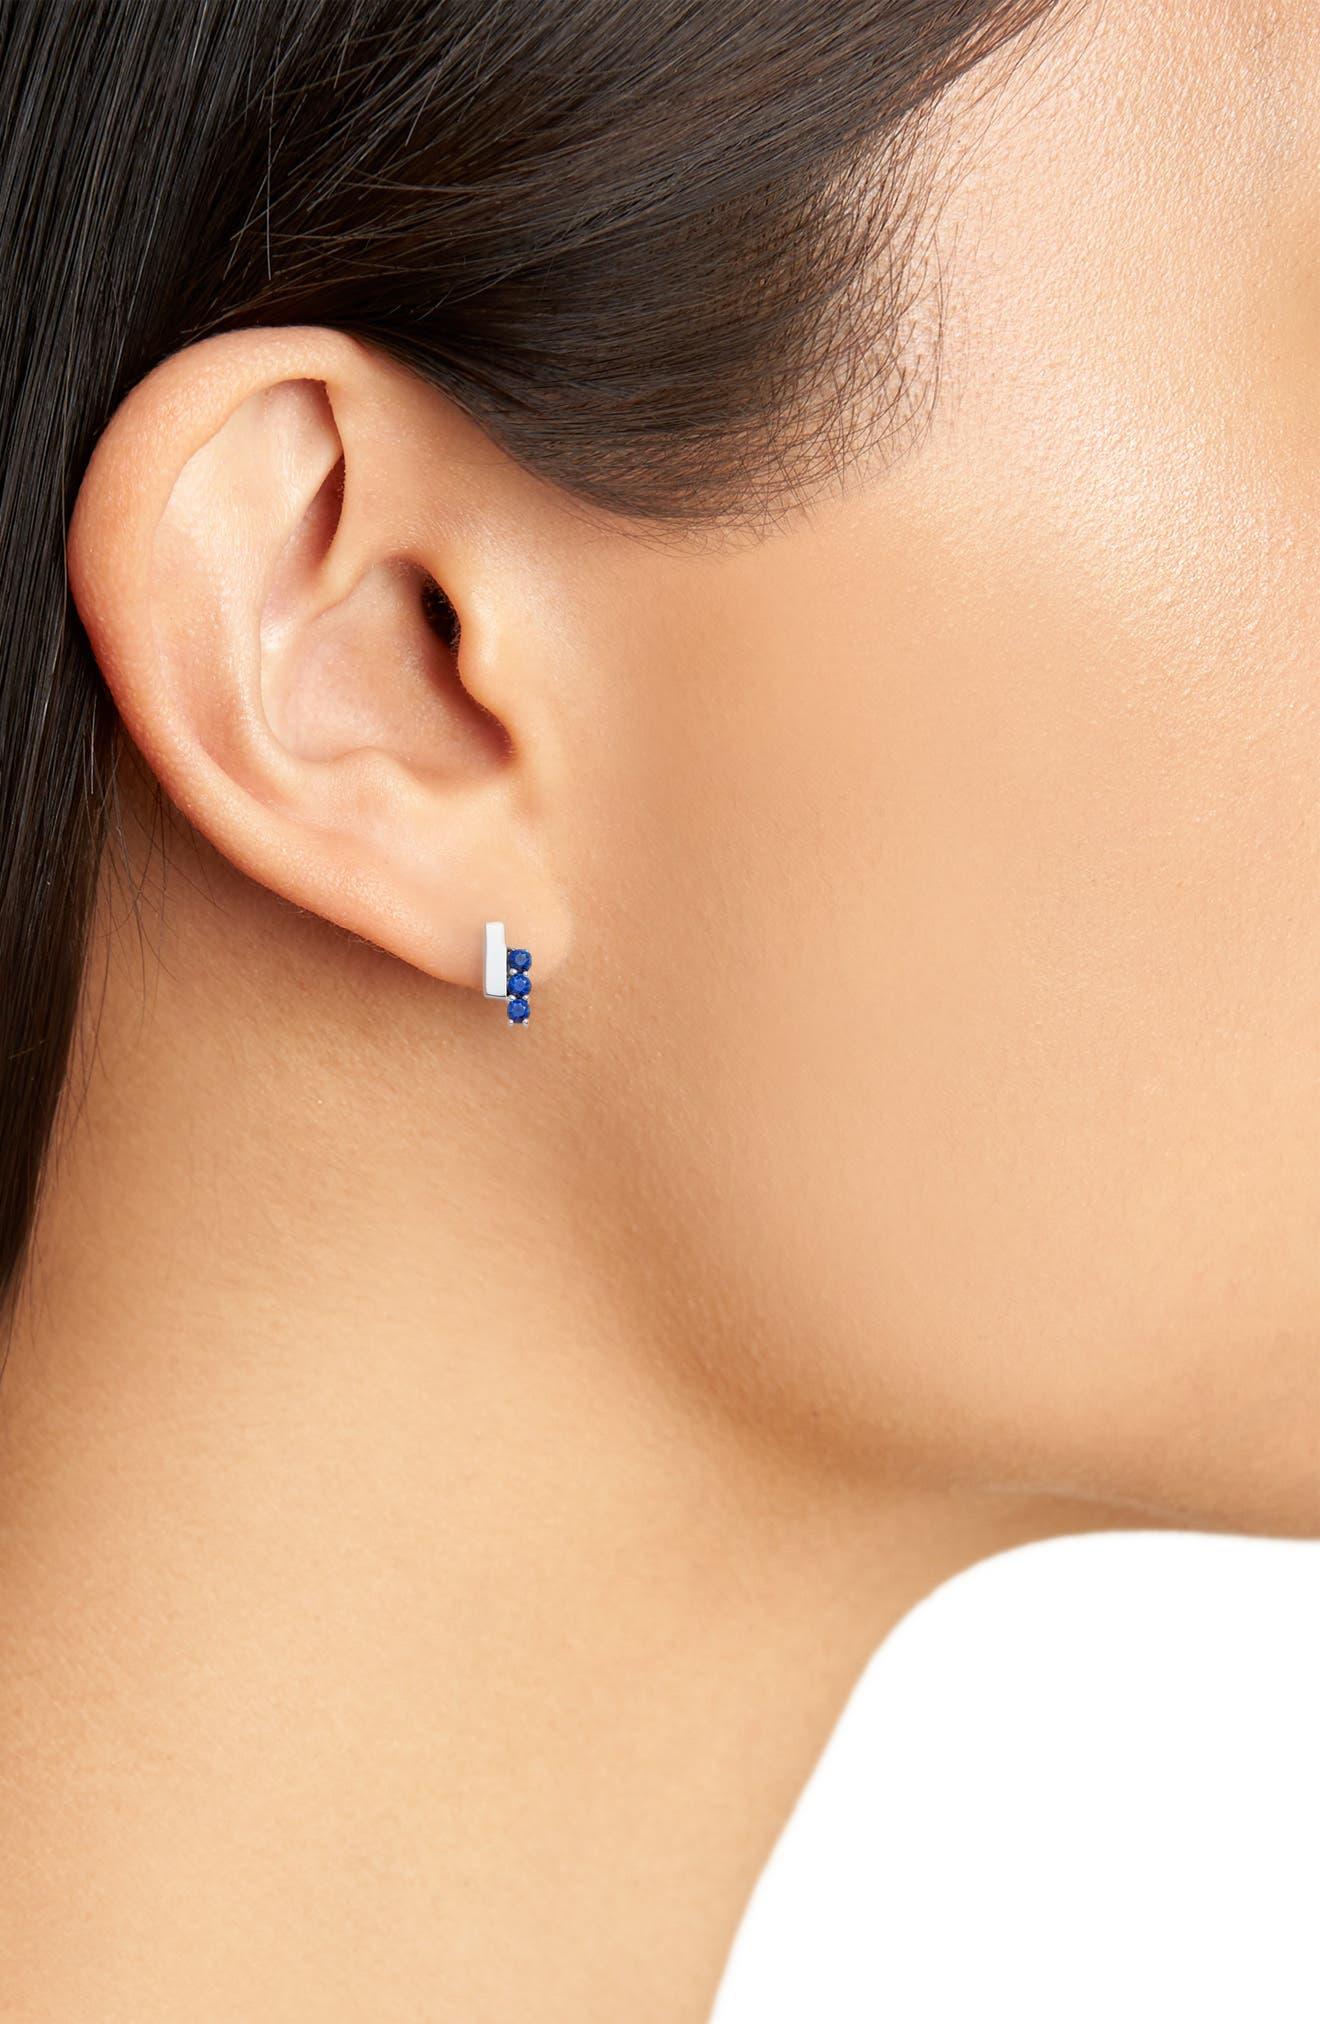 Sylvie Rose Sapphire Bar Stud Earrings,                             Alternate thumbnail 2, color,                             WHITE GOLD/ BLUE SAPPHIRE